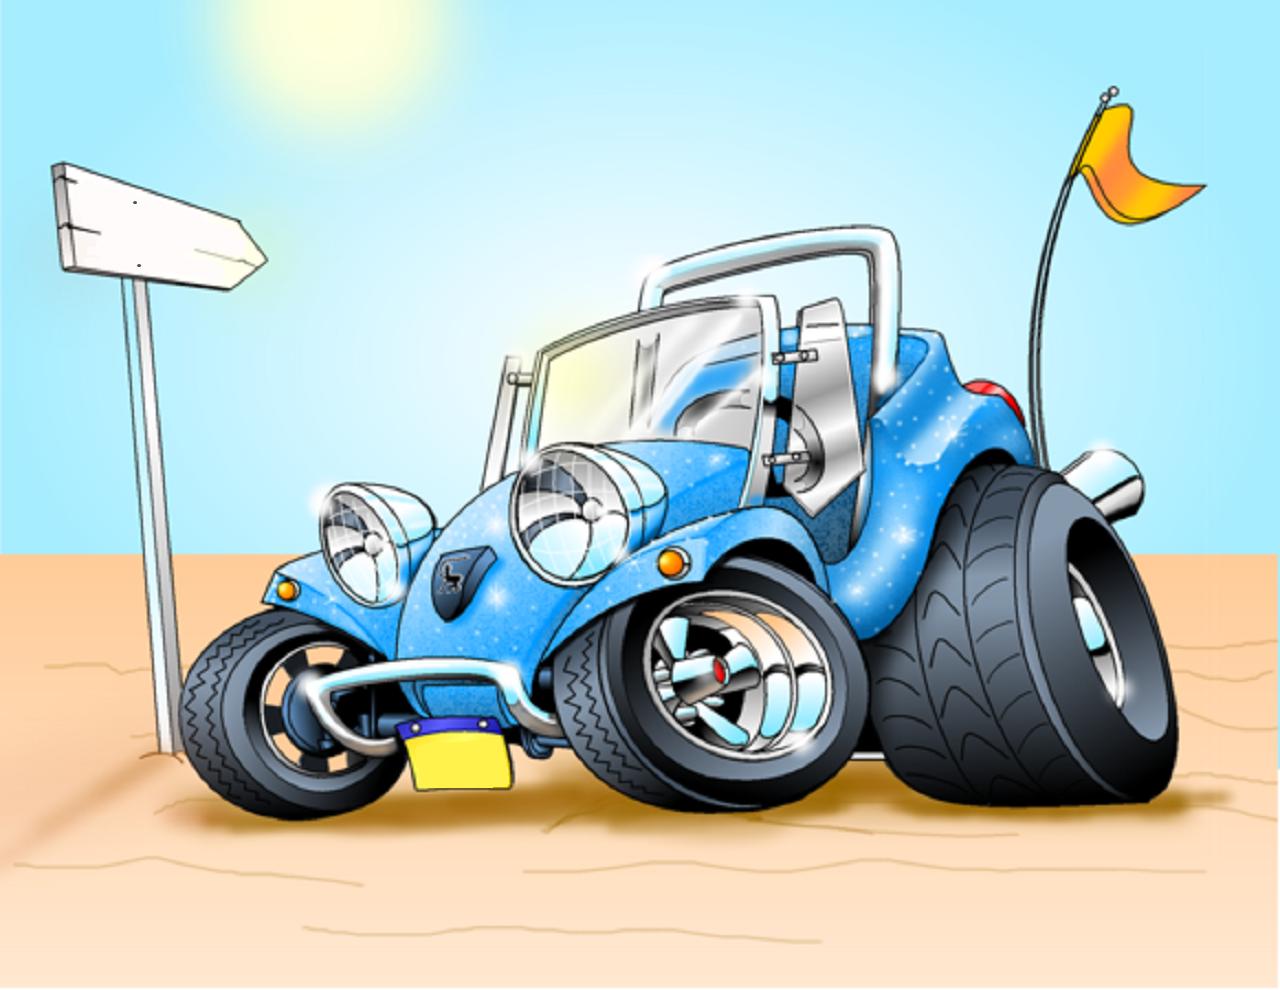 Pin By Darren Kopp On Car Toon 2 Cartoon Car Drawing Car Cartoon Vw Dune Buggy